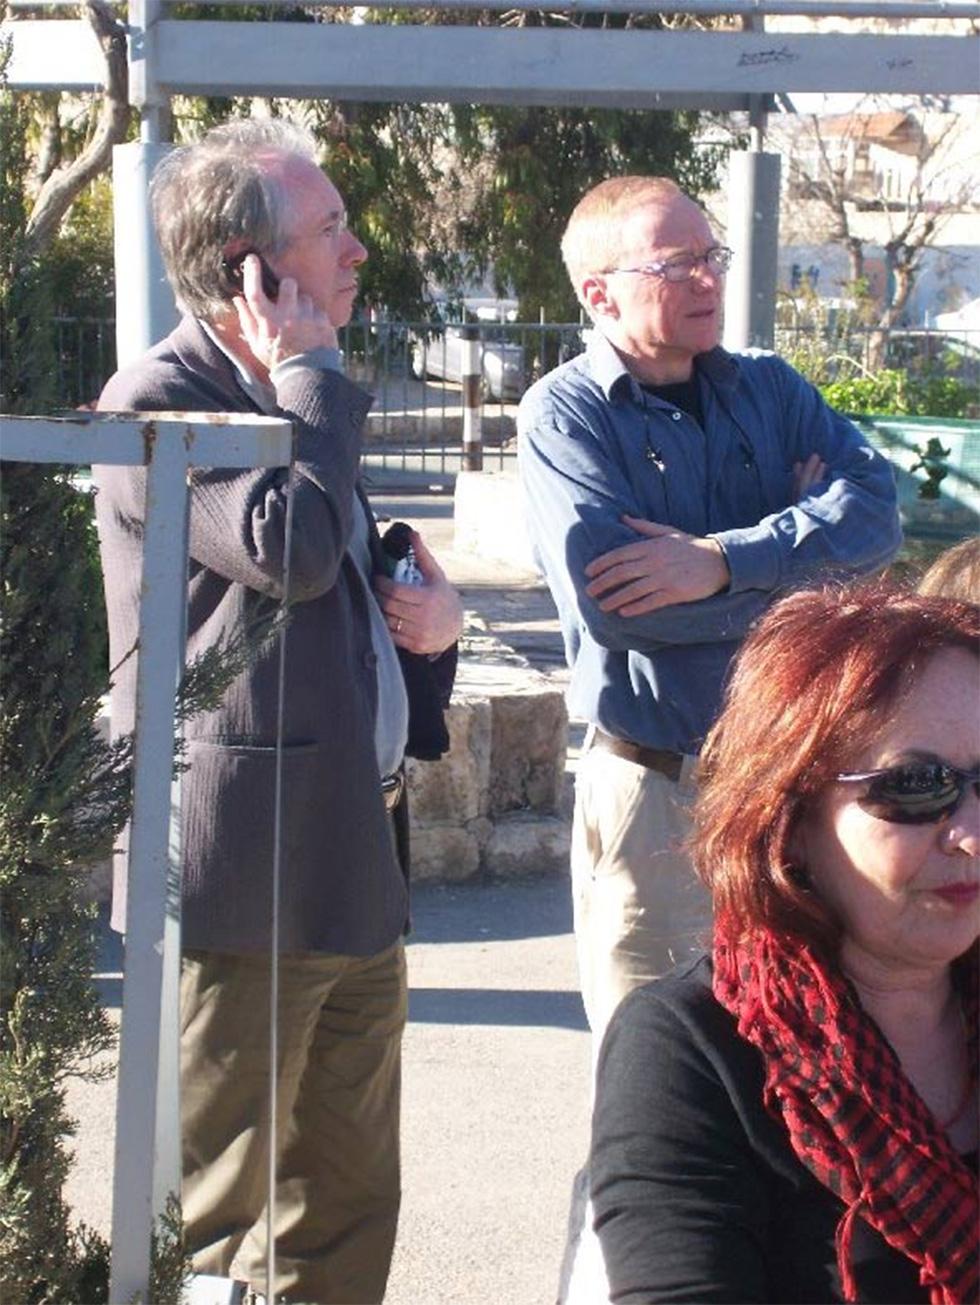 דויד גרוסמן ואיאן מקיואן בשייח ג'ראח ב-2011 (צילום: חן משגב) (צילום: חן משגב)